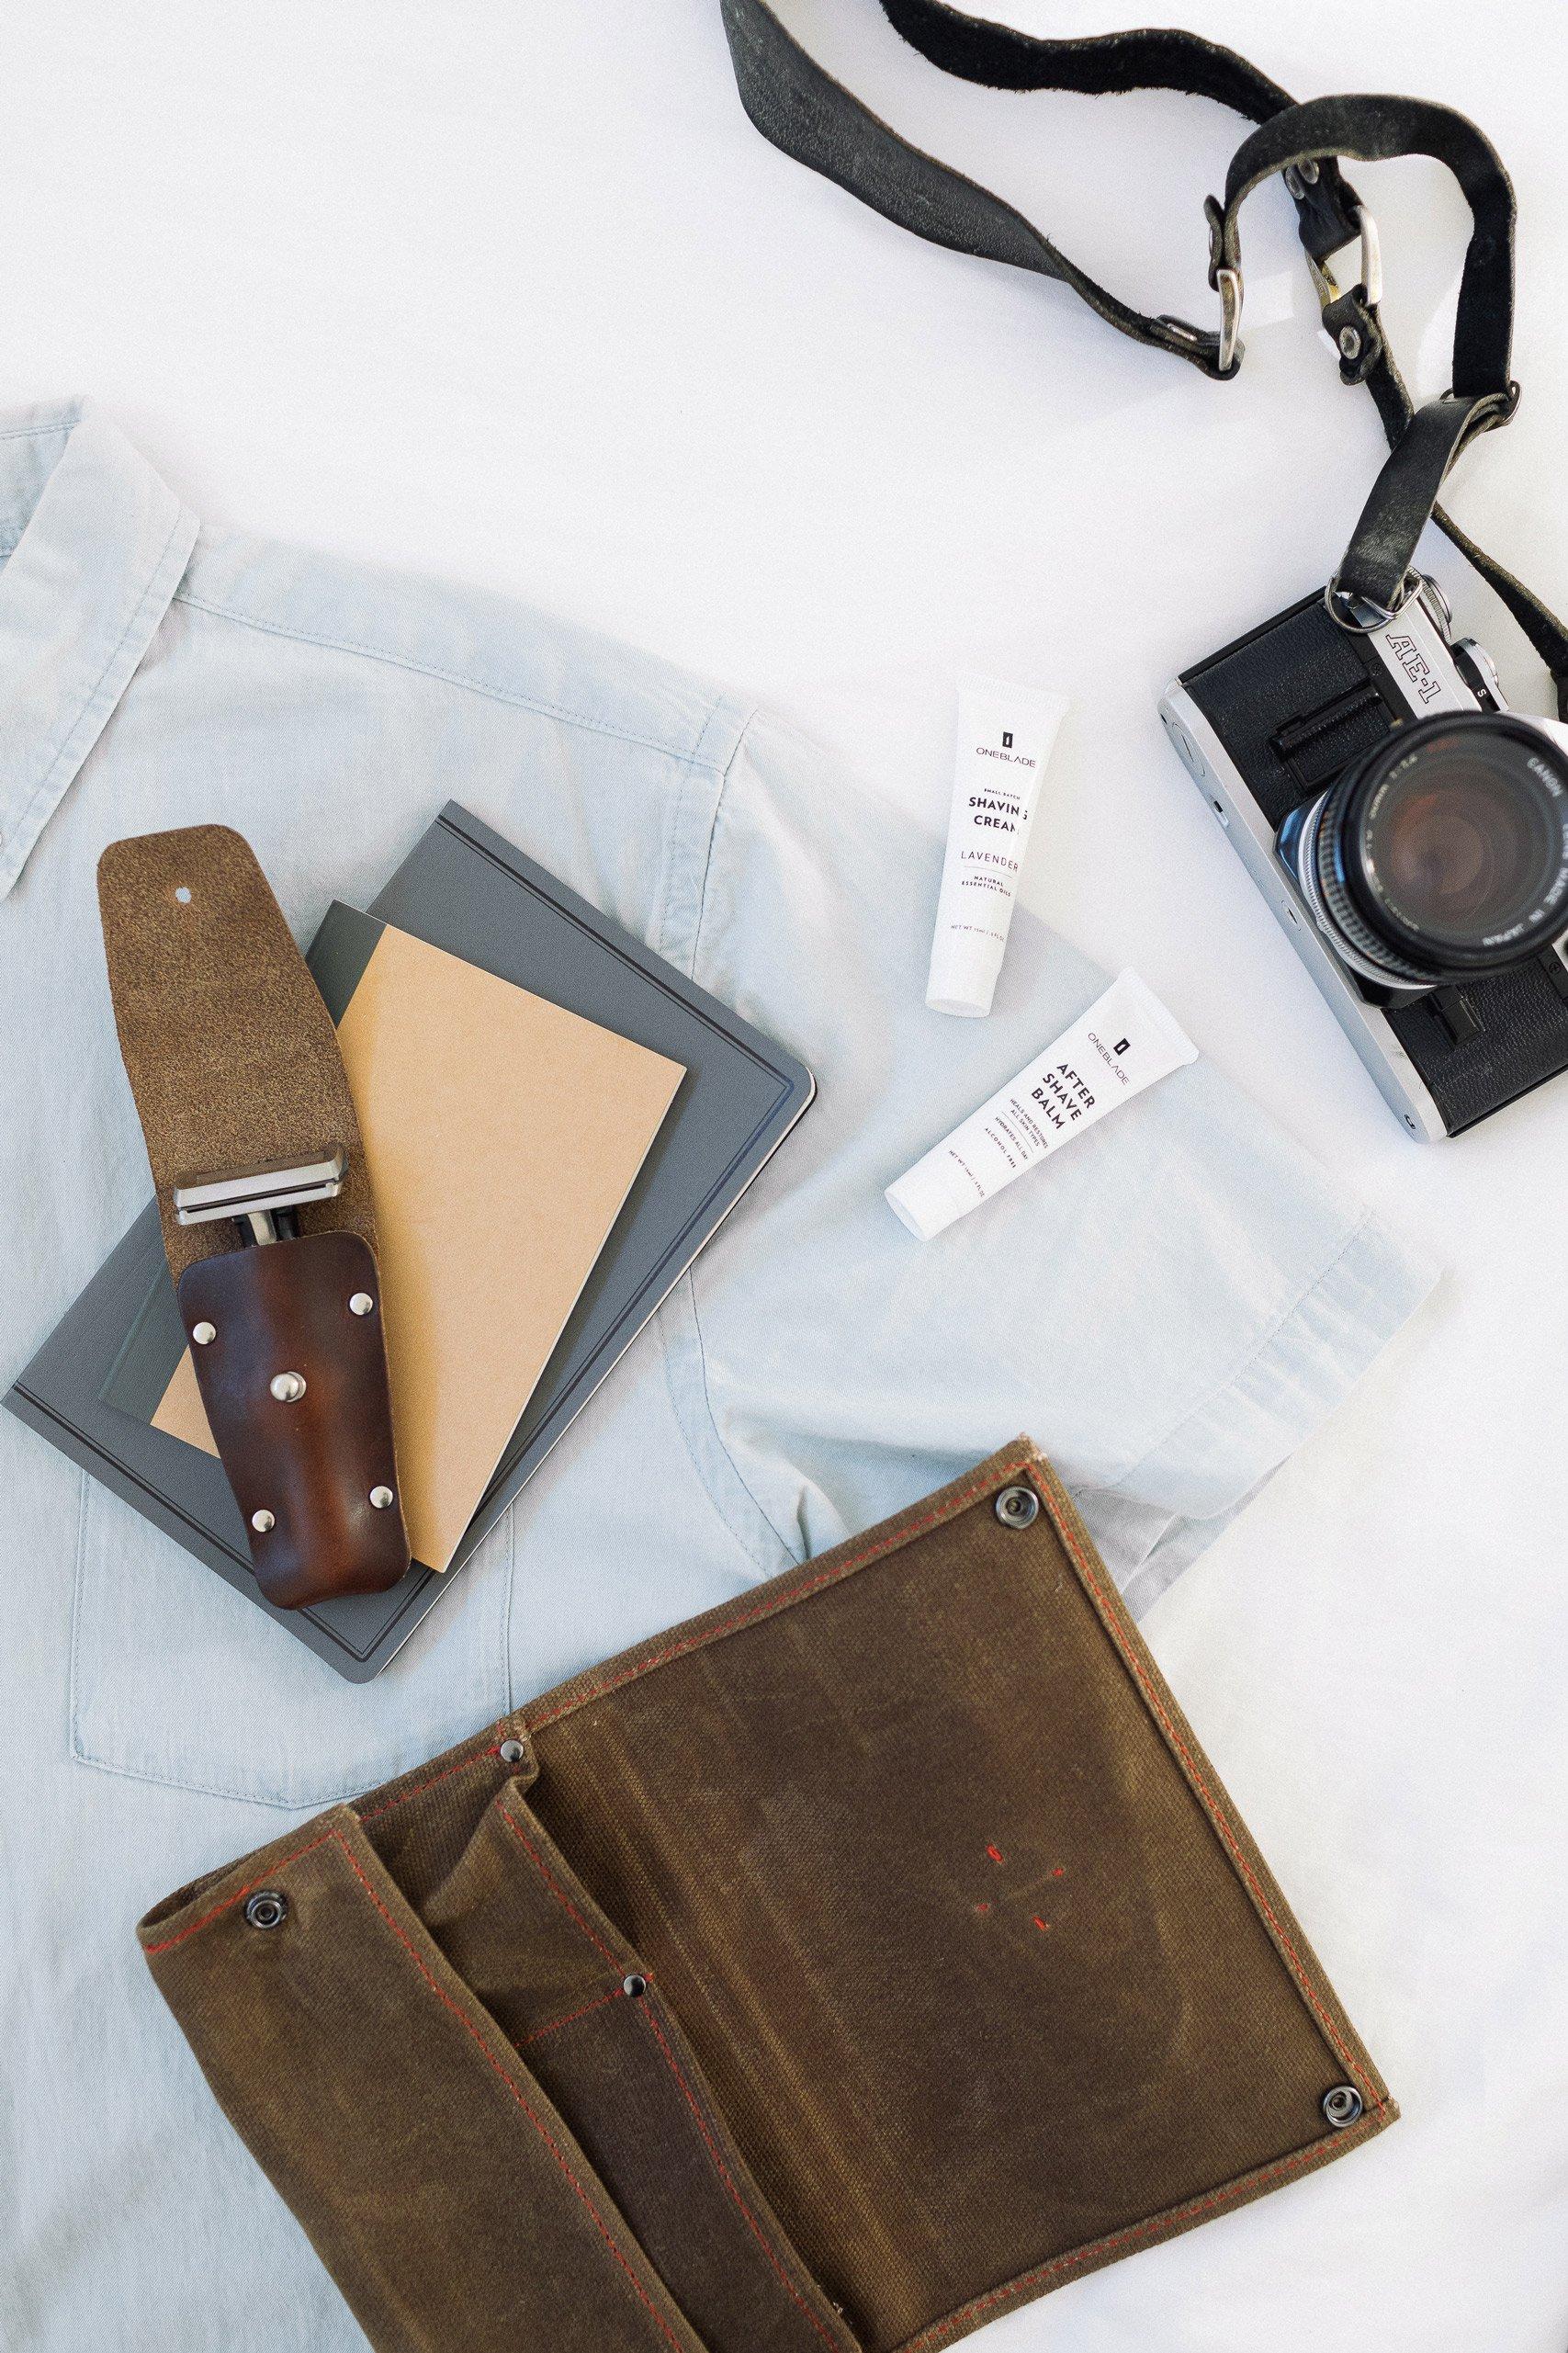 One-Blade-Leather-Razor-Holster-Hybrid-6